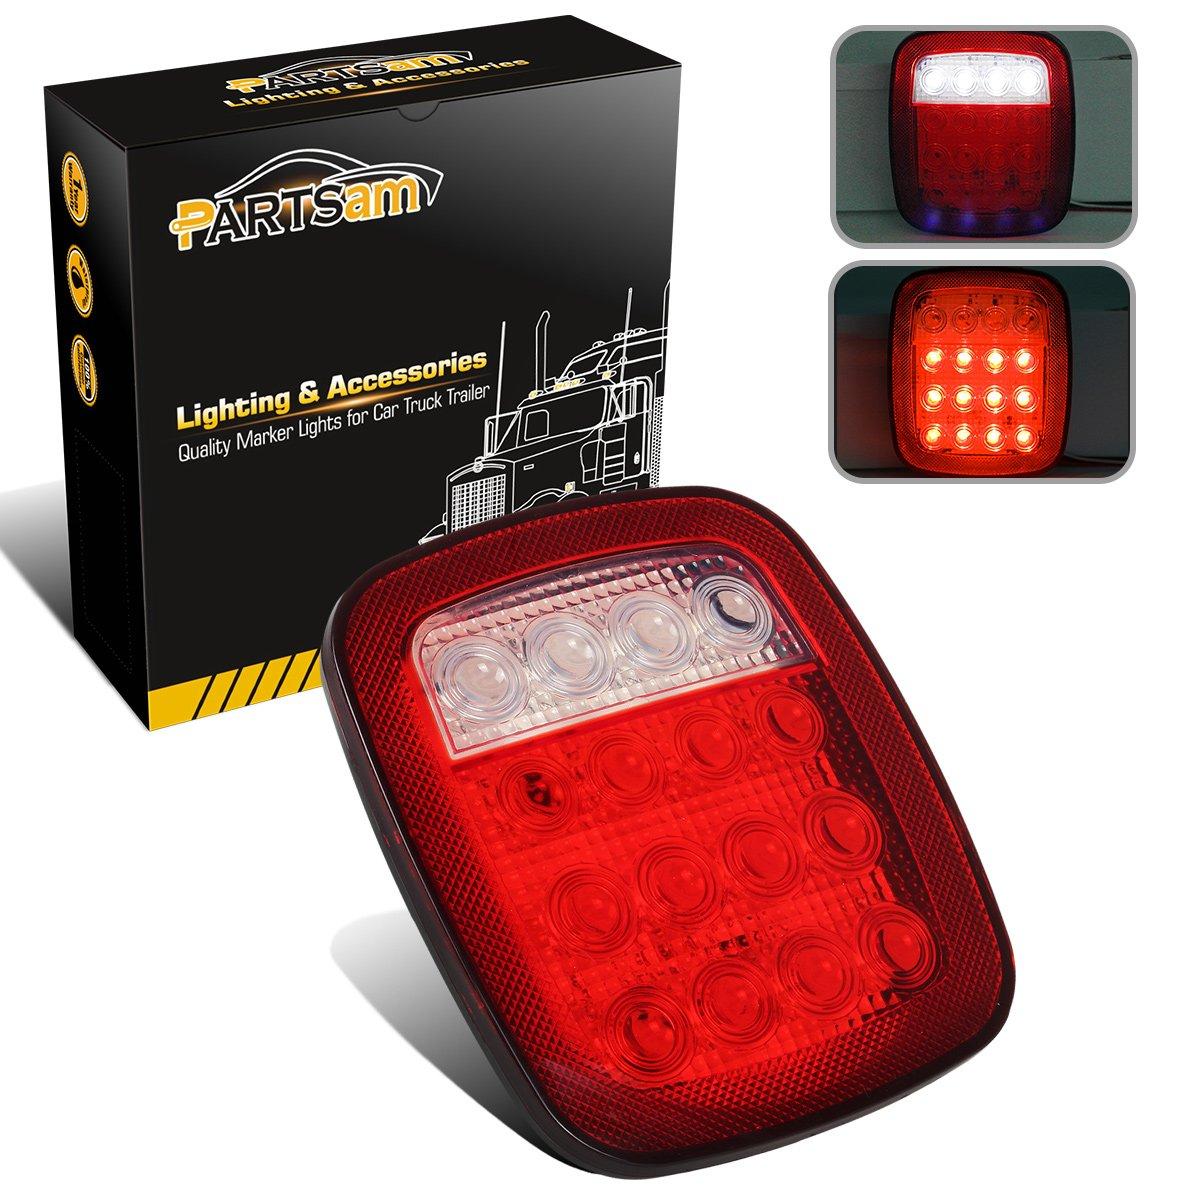 Partsam 2x Universal 16 LED Stop Tail Turn Signal Backup Reverse Brake Clearance Marker Lights Lamps Red/White for Truck Trailer Jeep YJ JK CJ Waterproof 12V Partsam-131703